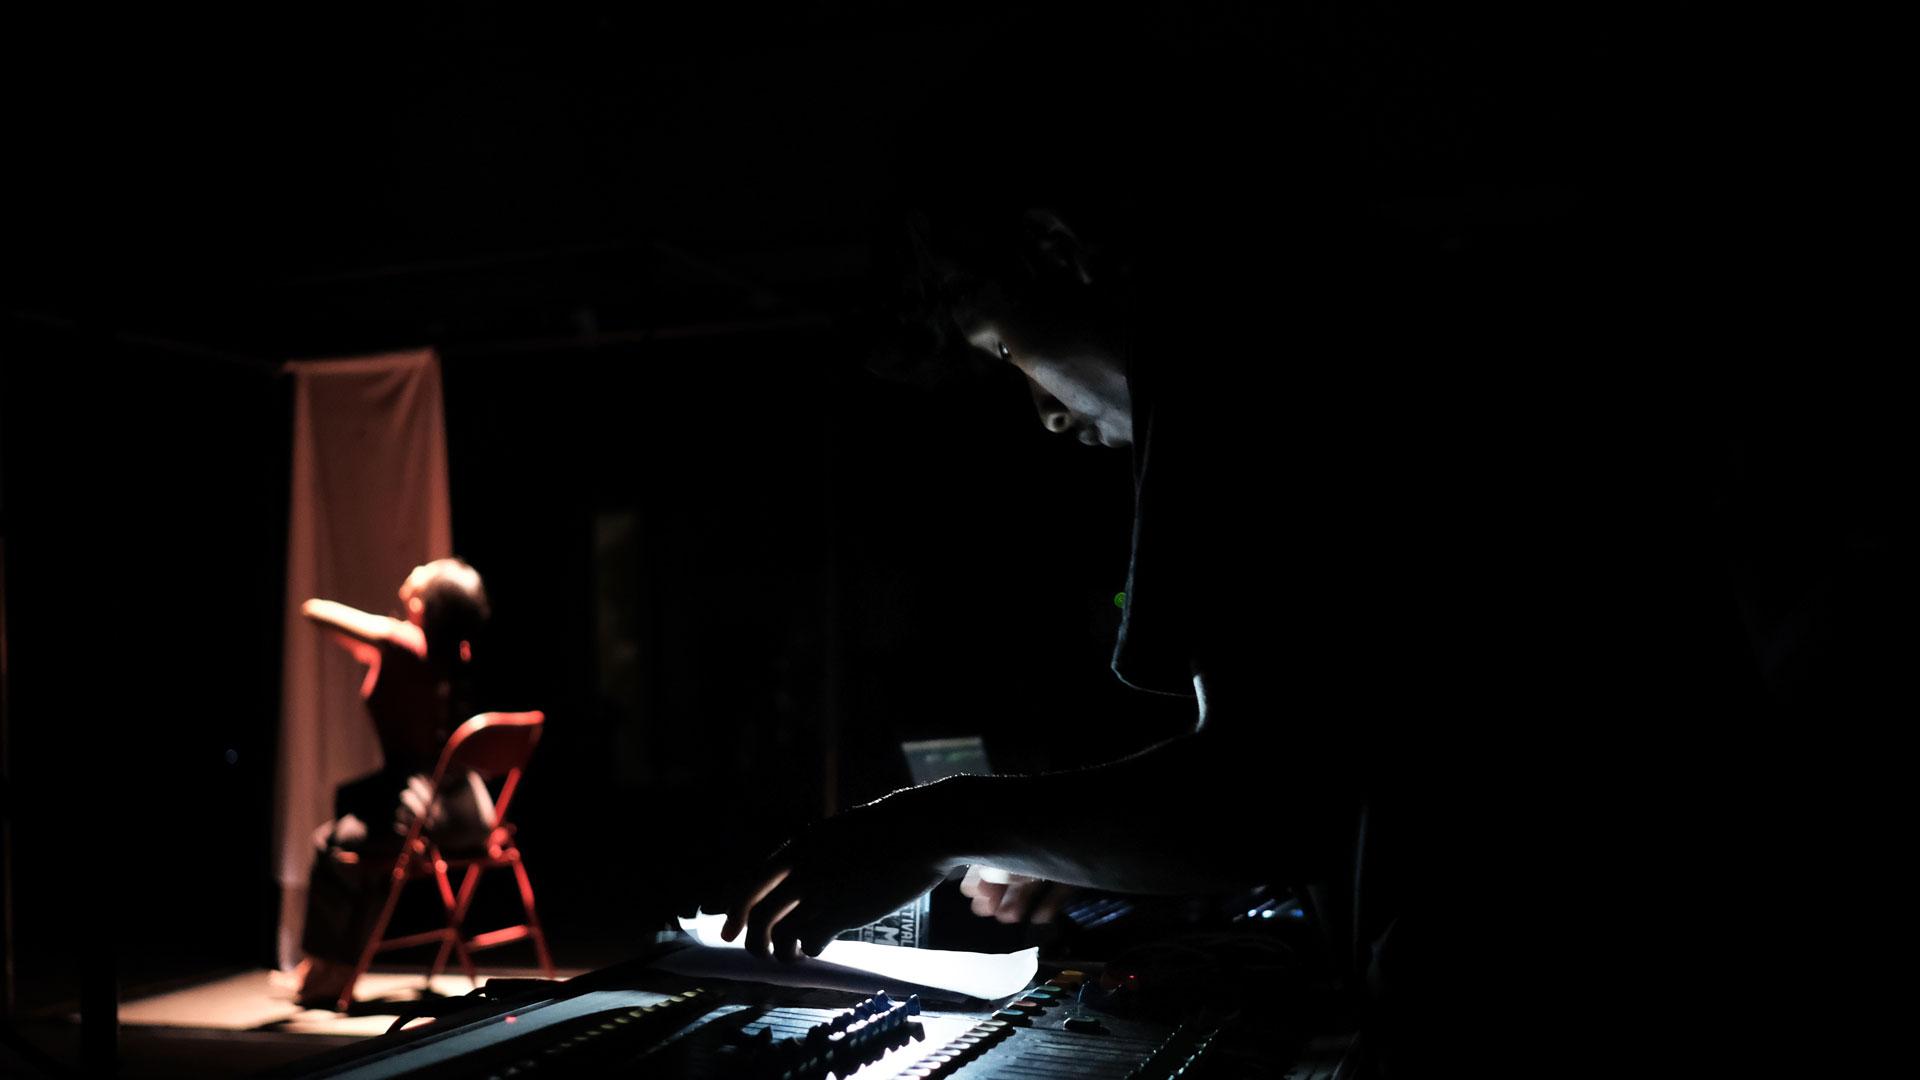 PSBK | Tata Cahaya